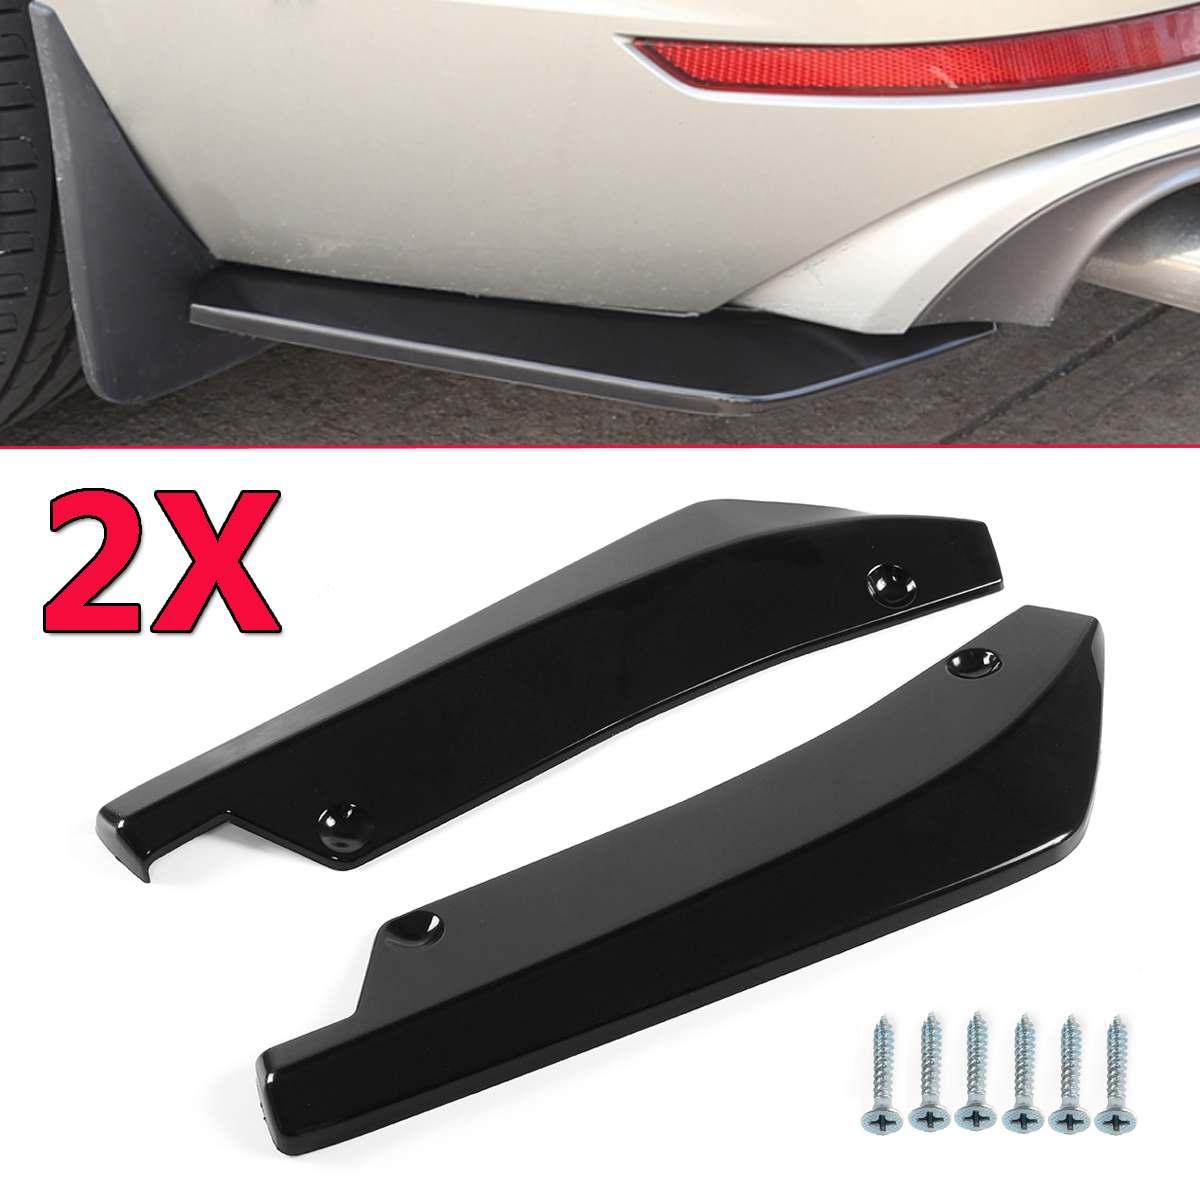 2PCS Universal Carbon Fiber Look/ Black Car Rear Bumper Lip Diffuser Splitter Canard Spoiler Protector For Benz For BMW For Ford